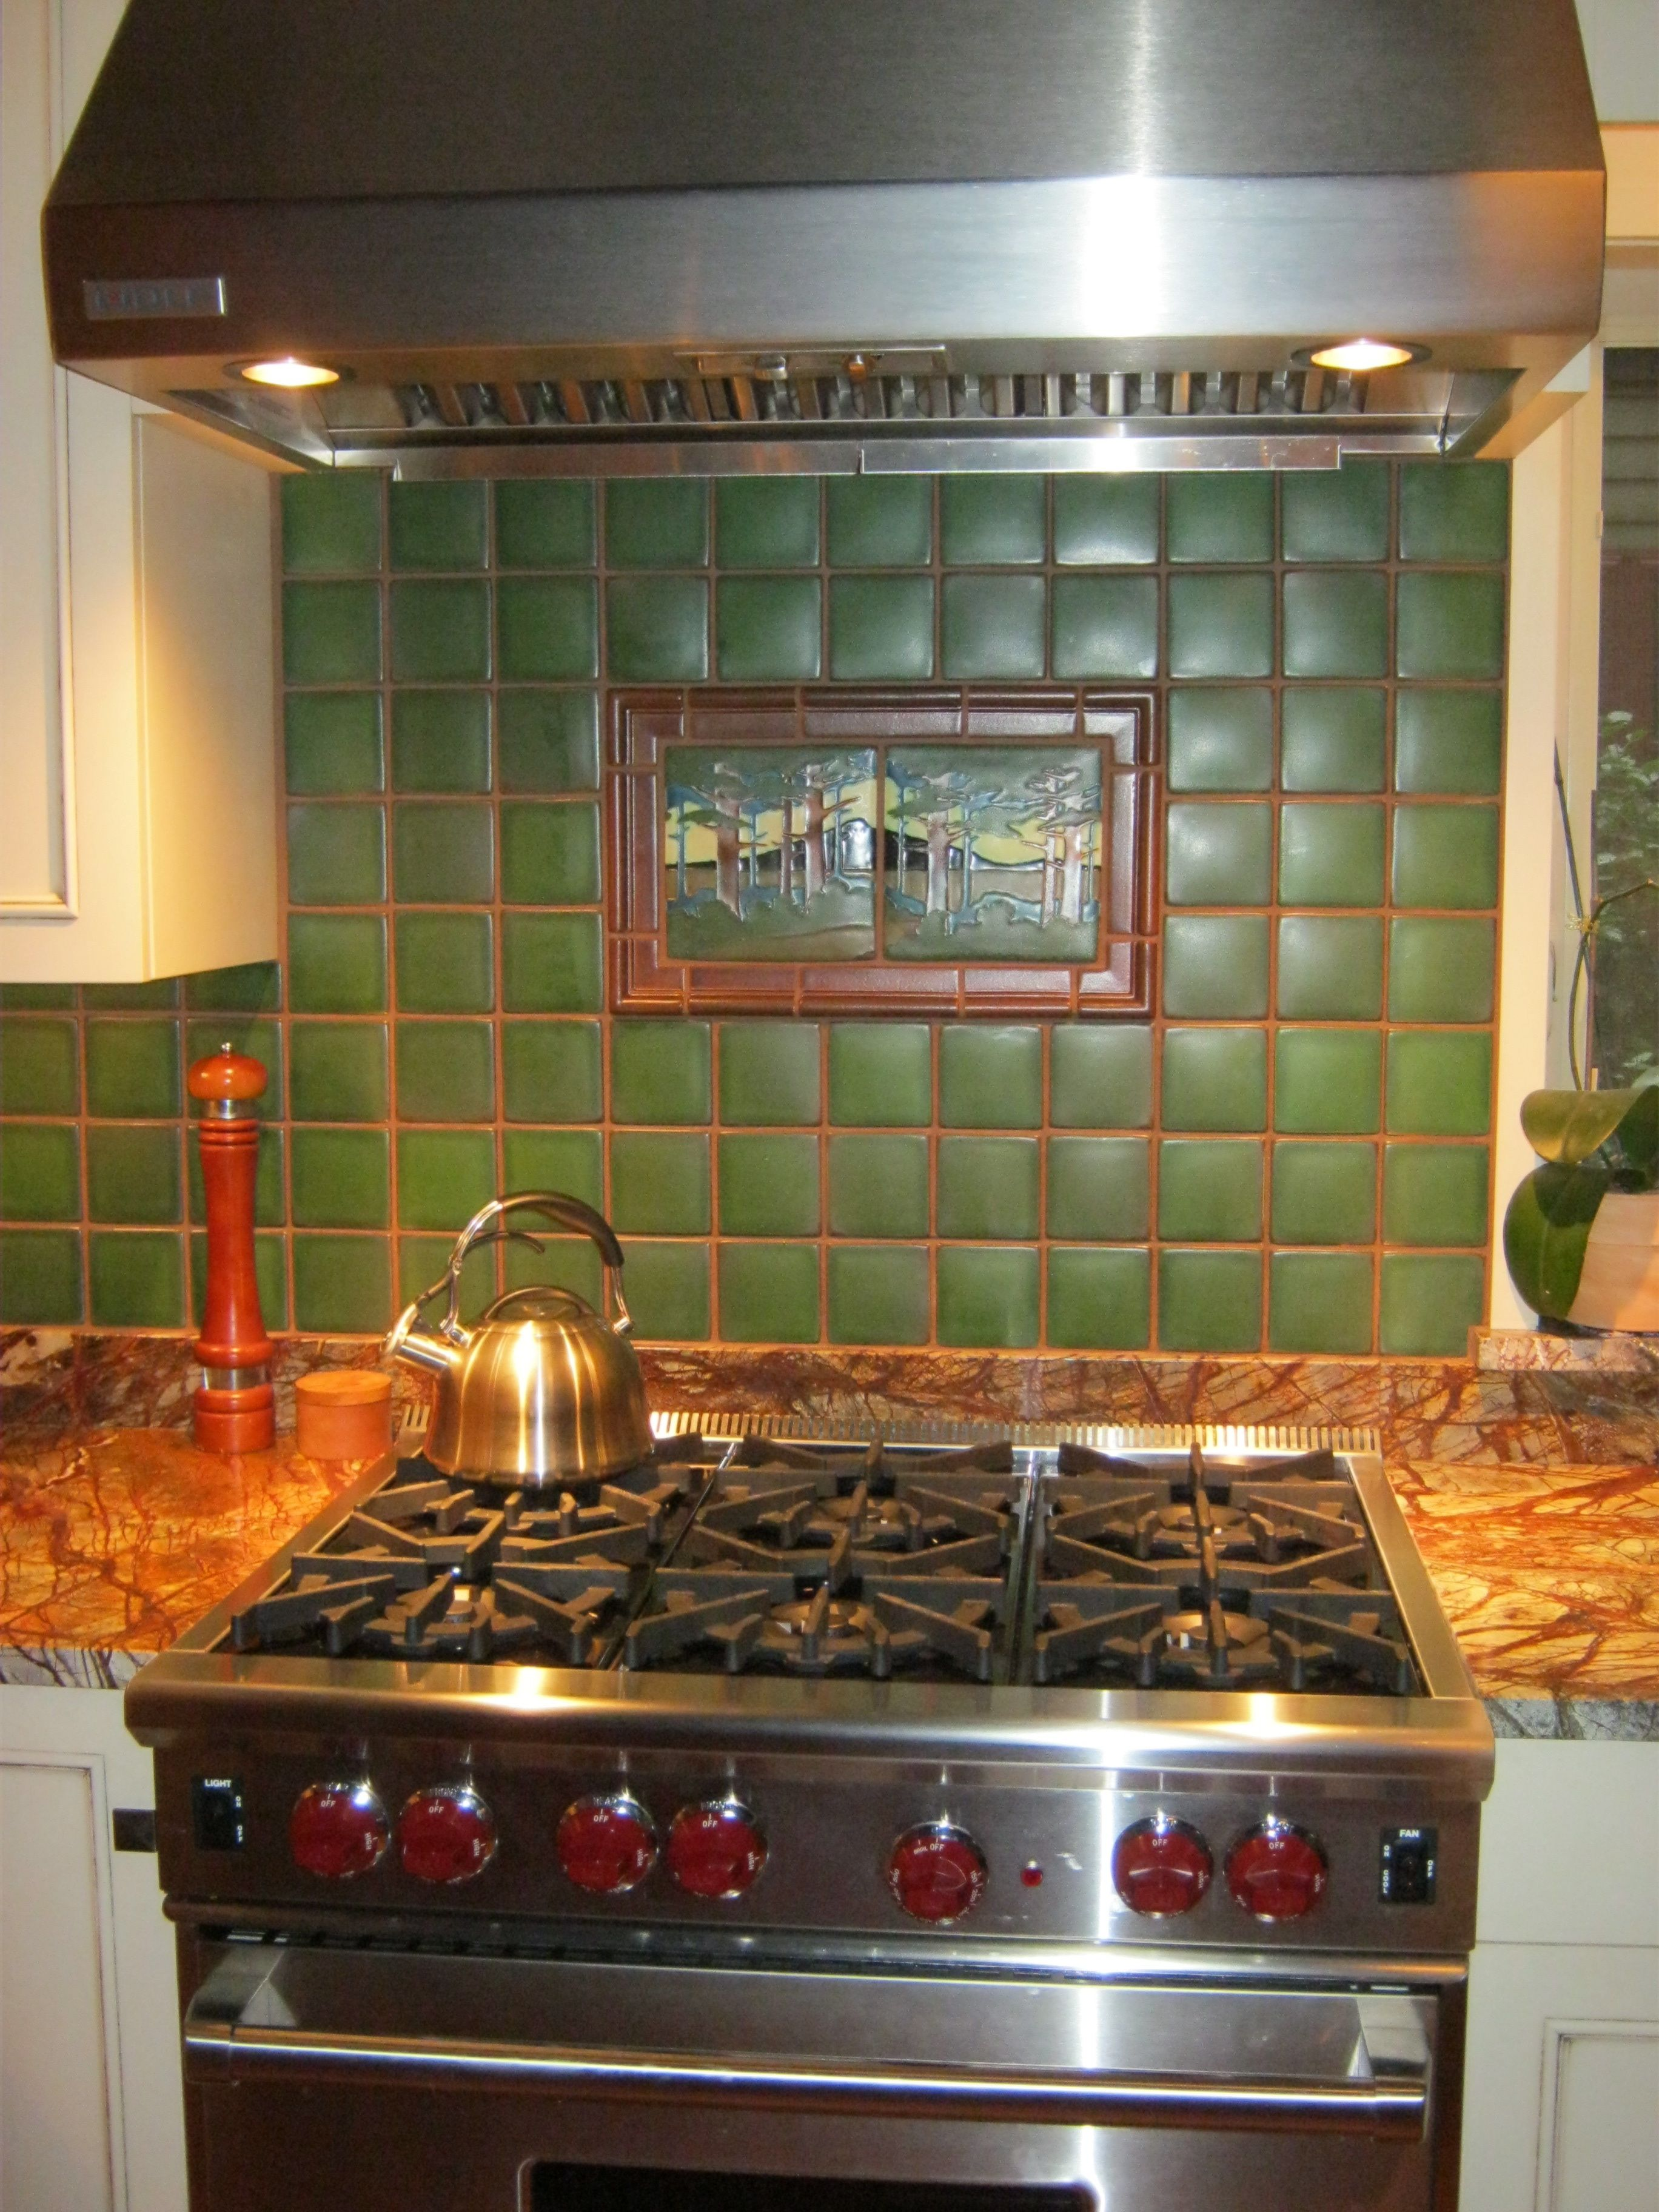 craftsman kitchen backsplash subway tile for motawi at ceramiche and stone